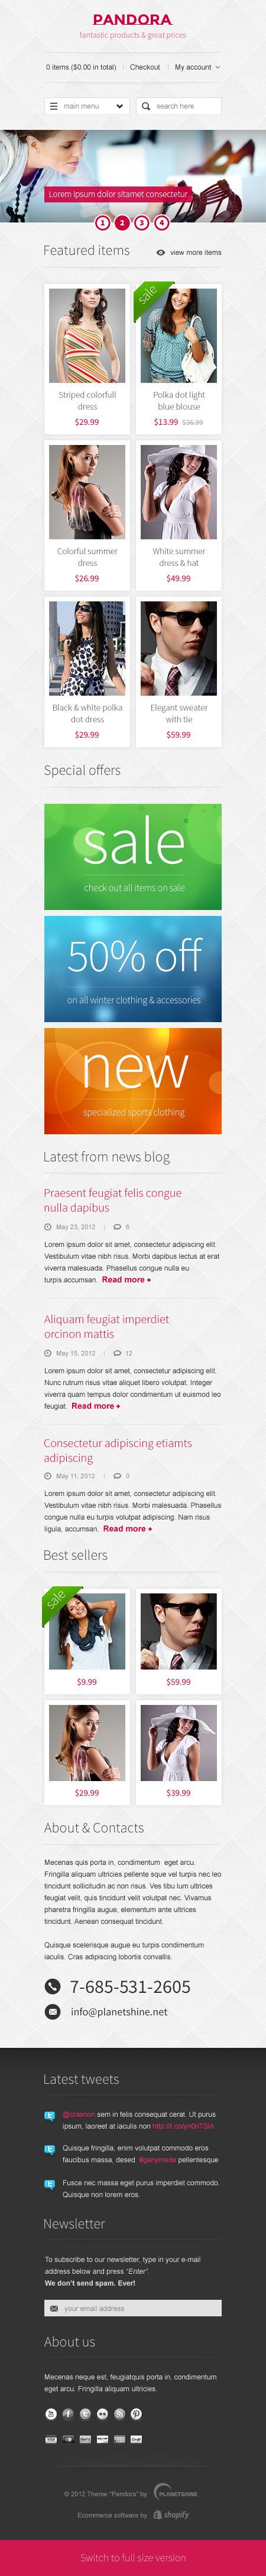 Pandora — Premium Responsive HTML5 & CSS3 Template